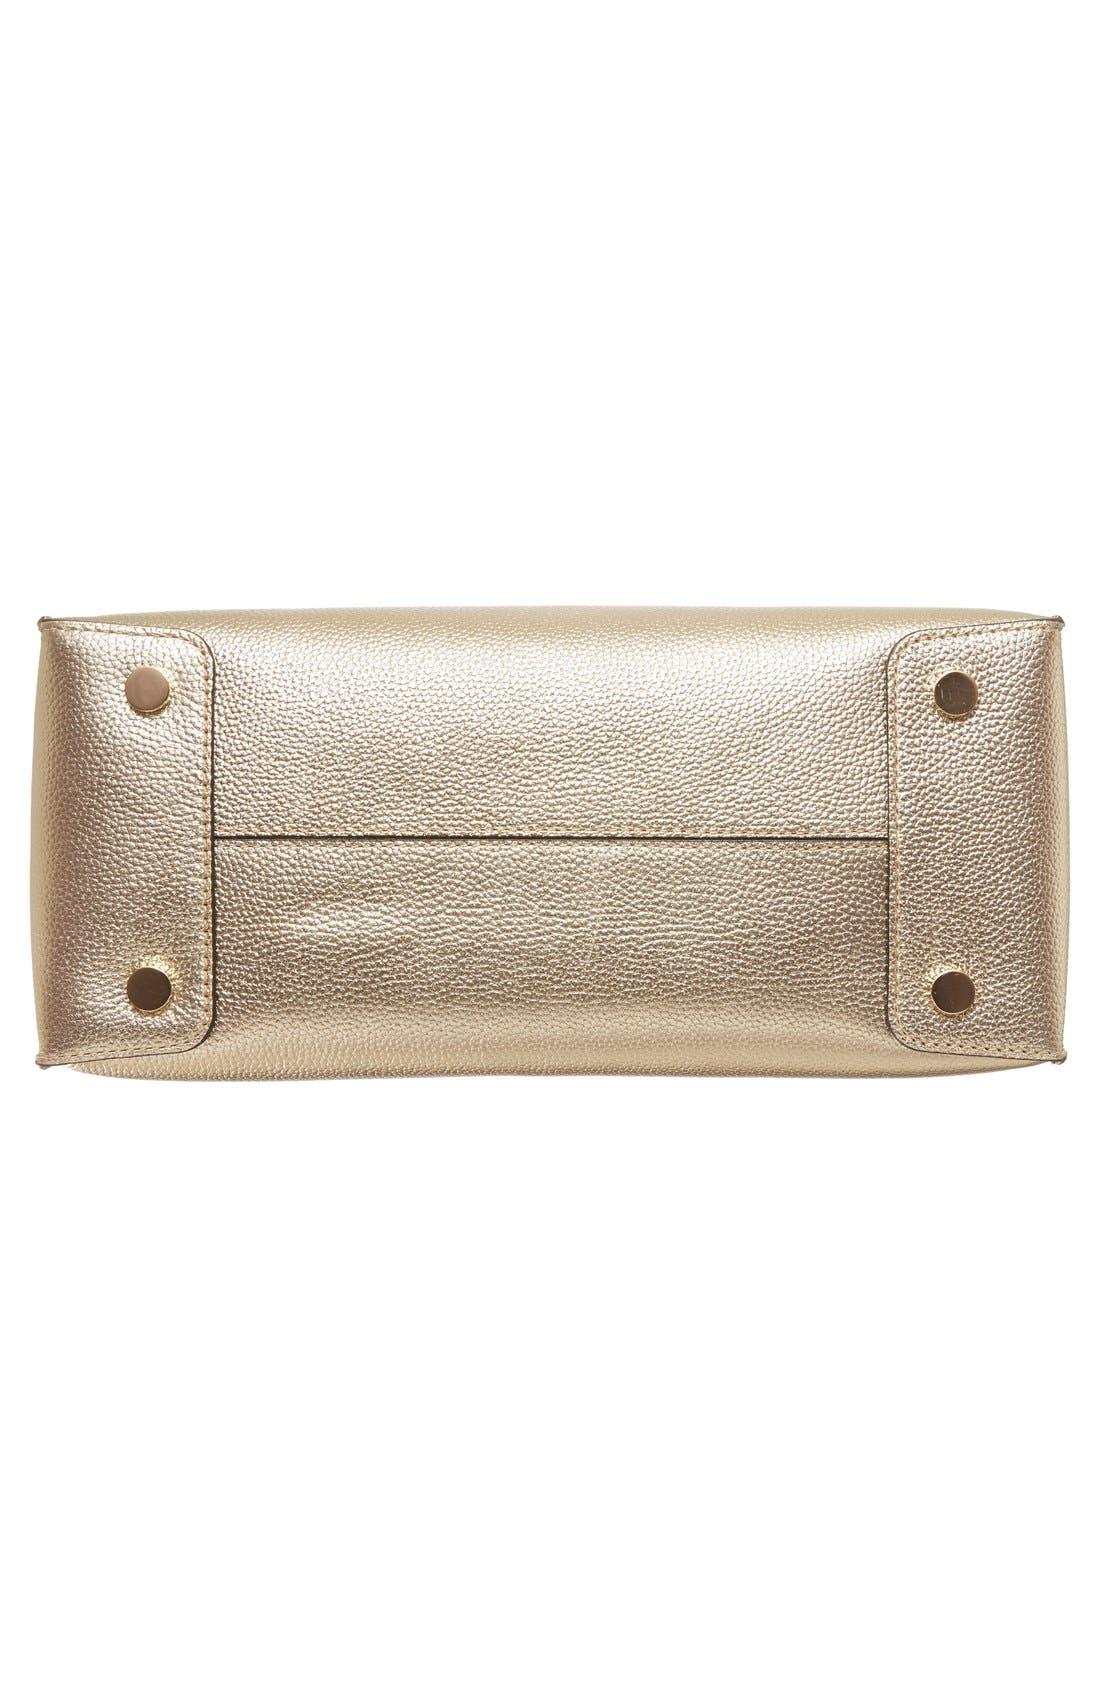 Large Mercer Metallic Leather Tote,                             Alternate thumbnail 7, color,                             740